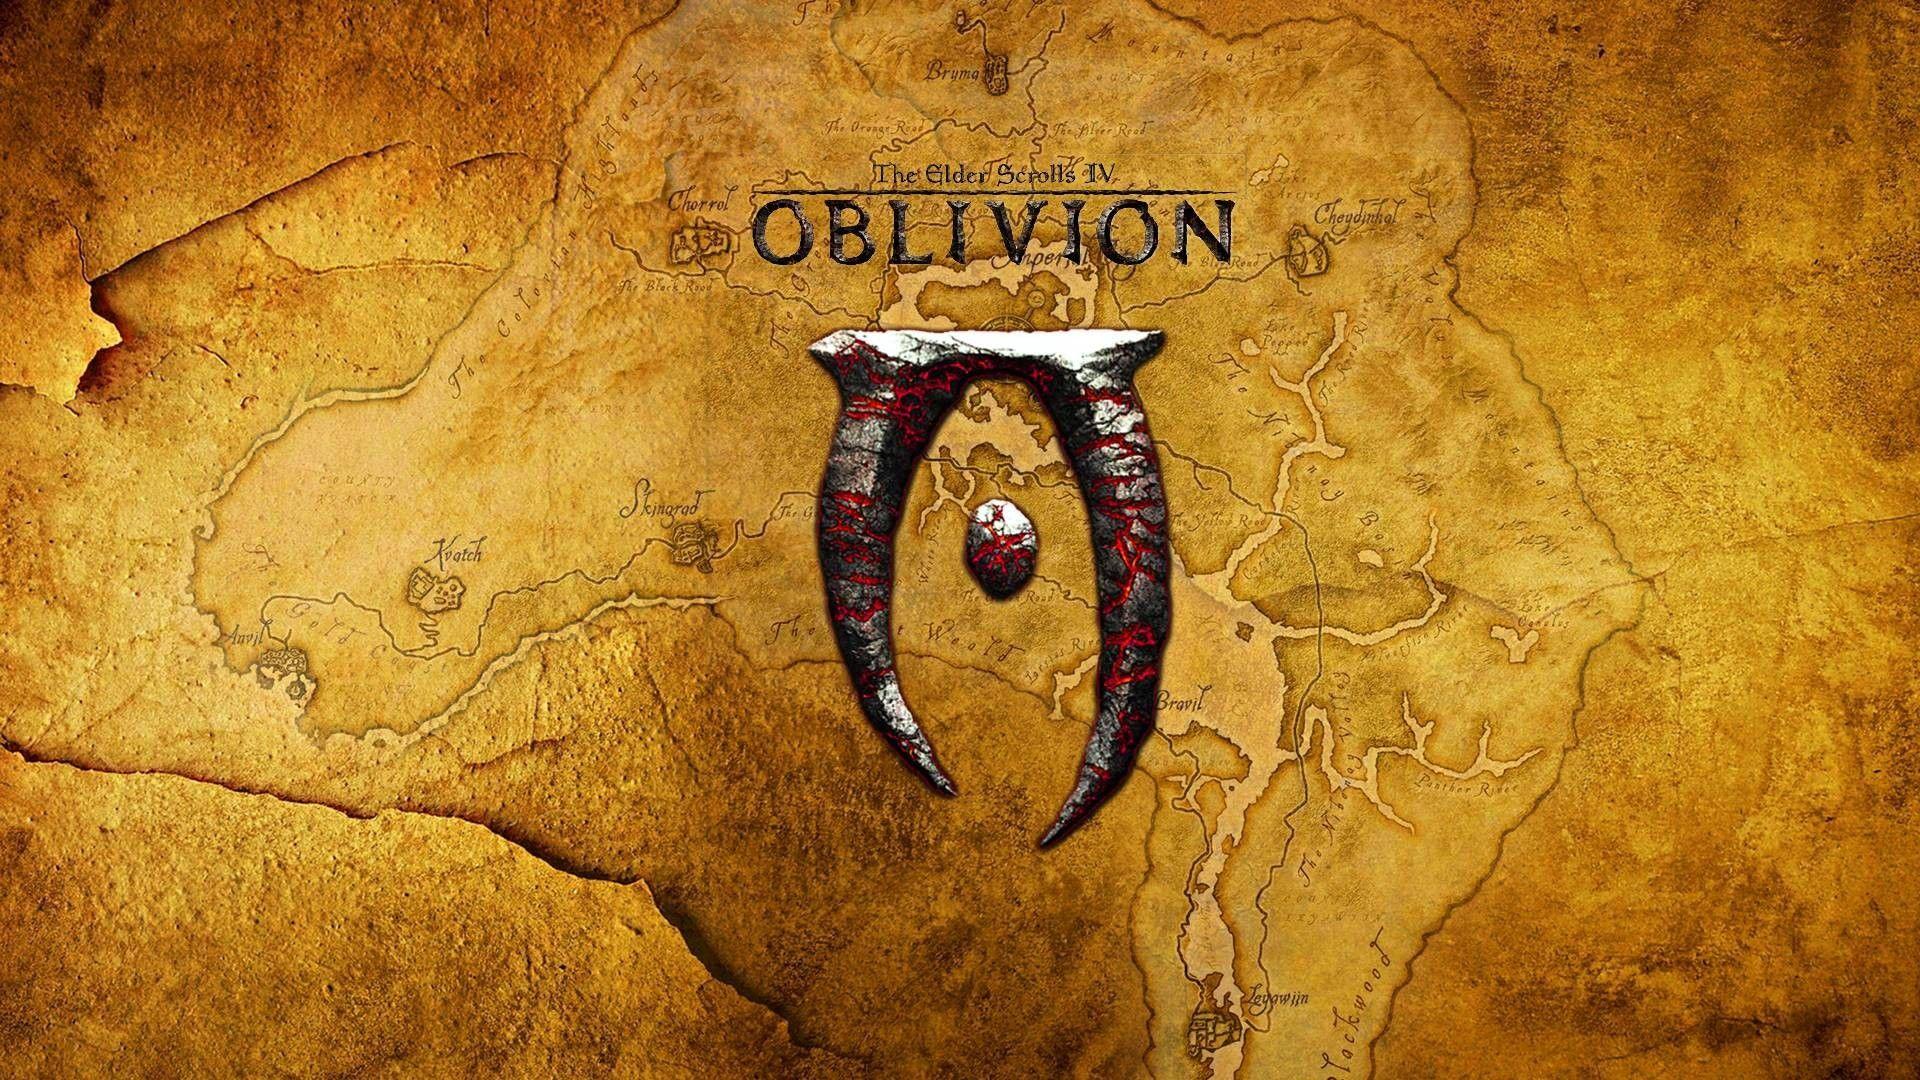 oblivion-arriva-su-xbox-one